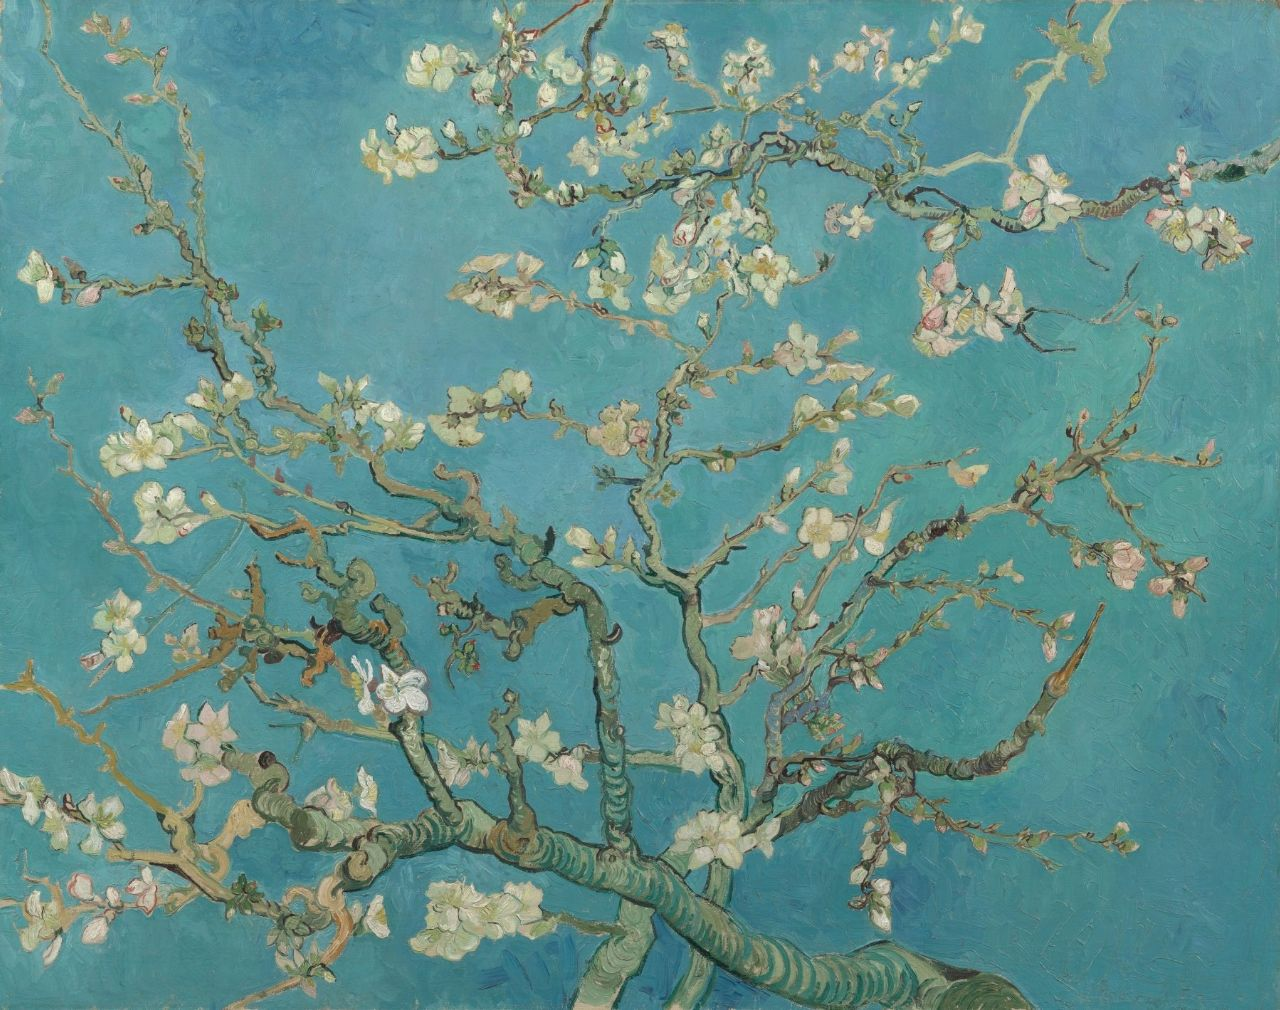 Almond Blossom - Vincent van Gogh - Van Gogh Museum